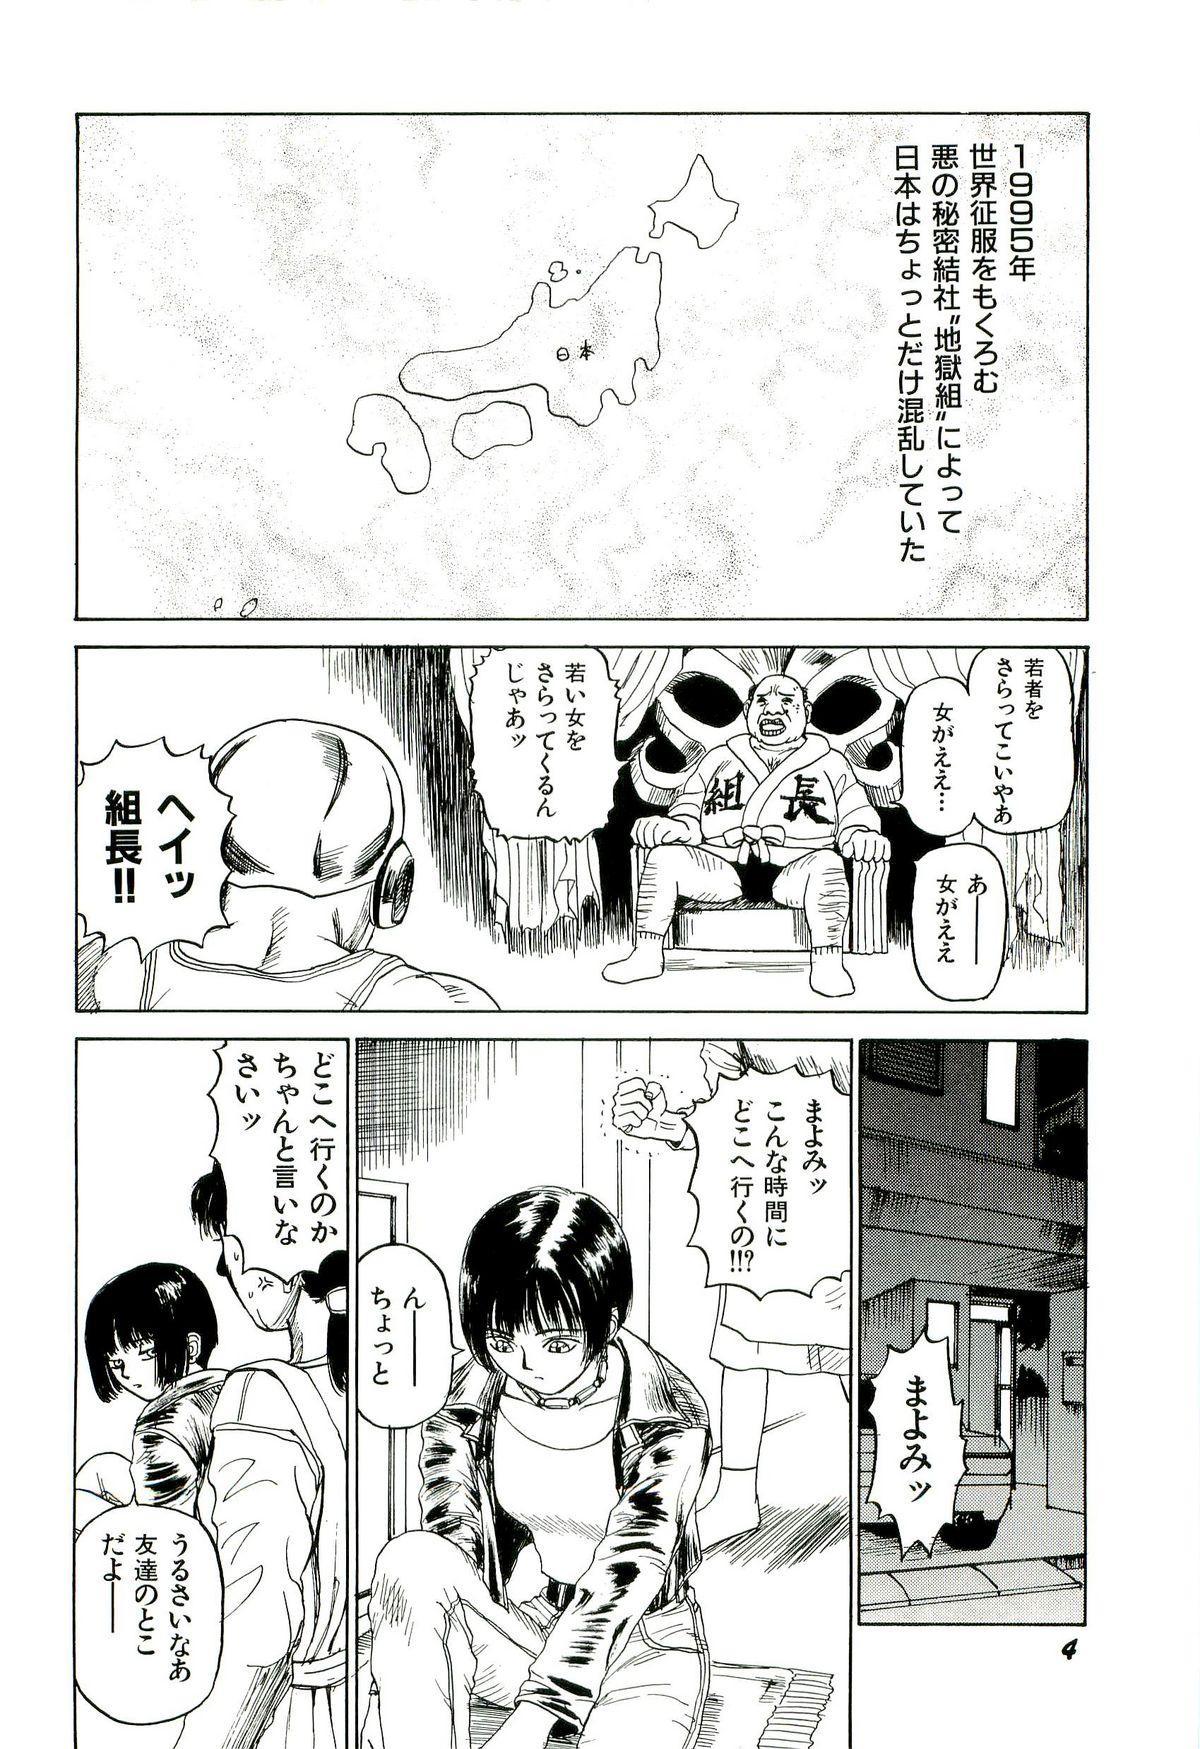 Jigokugumi no Onna 1 5